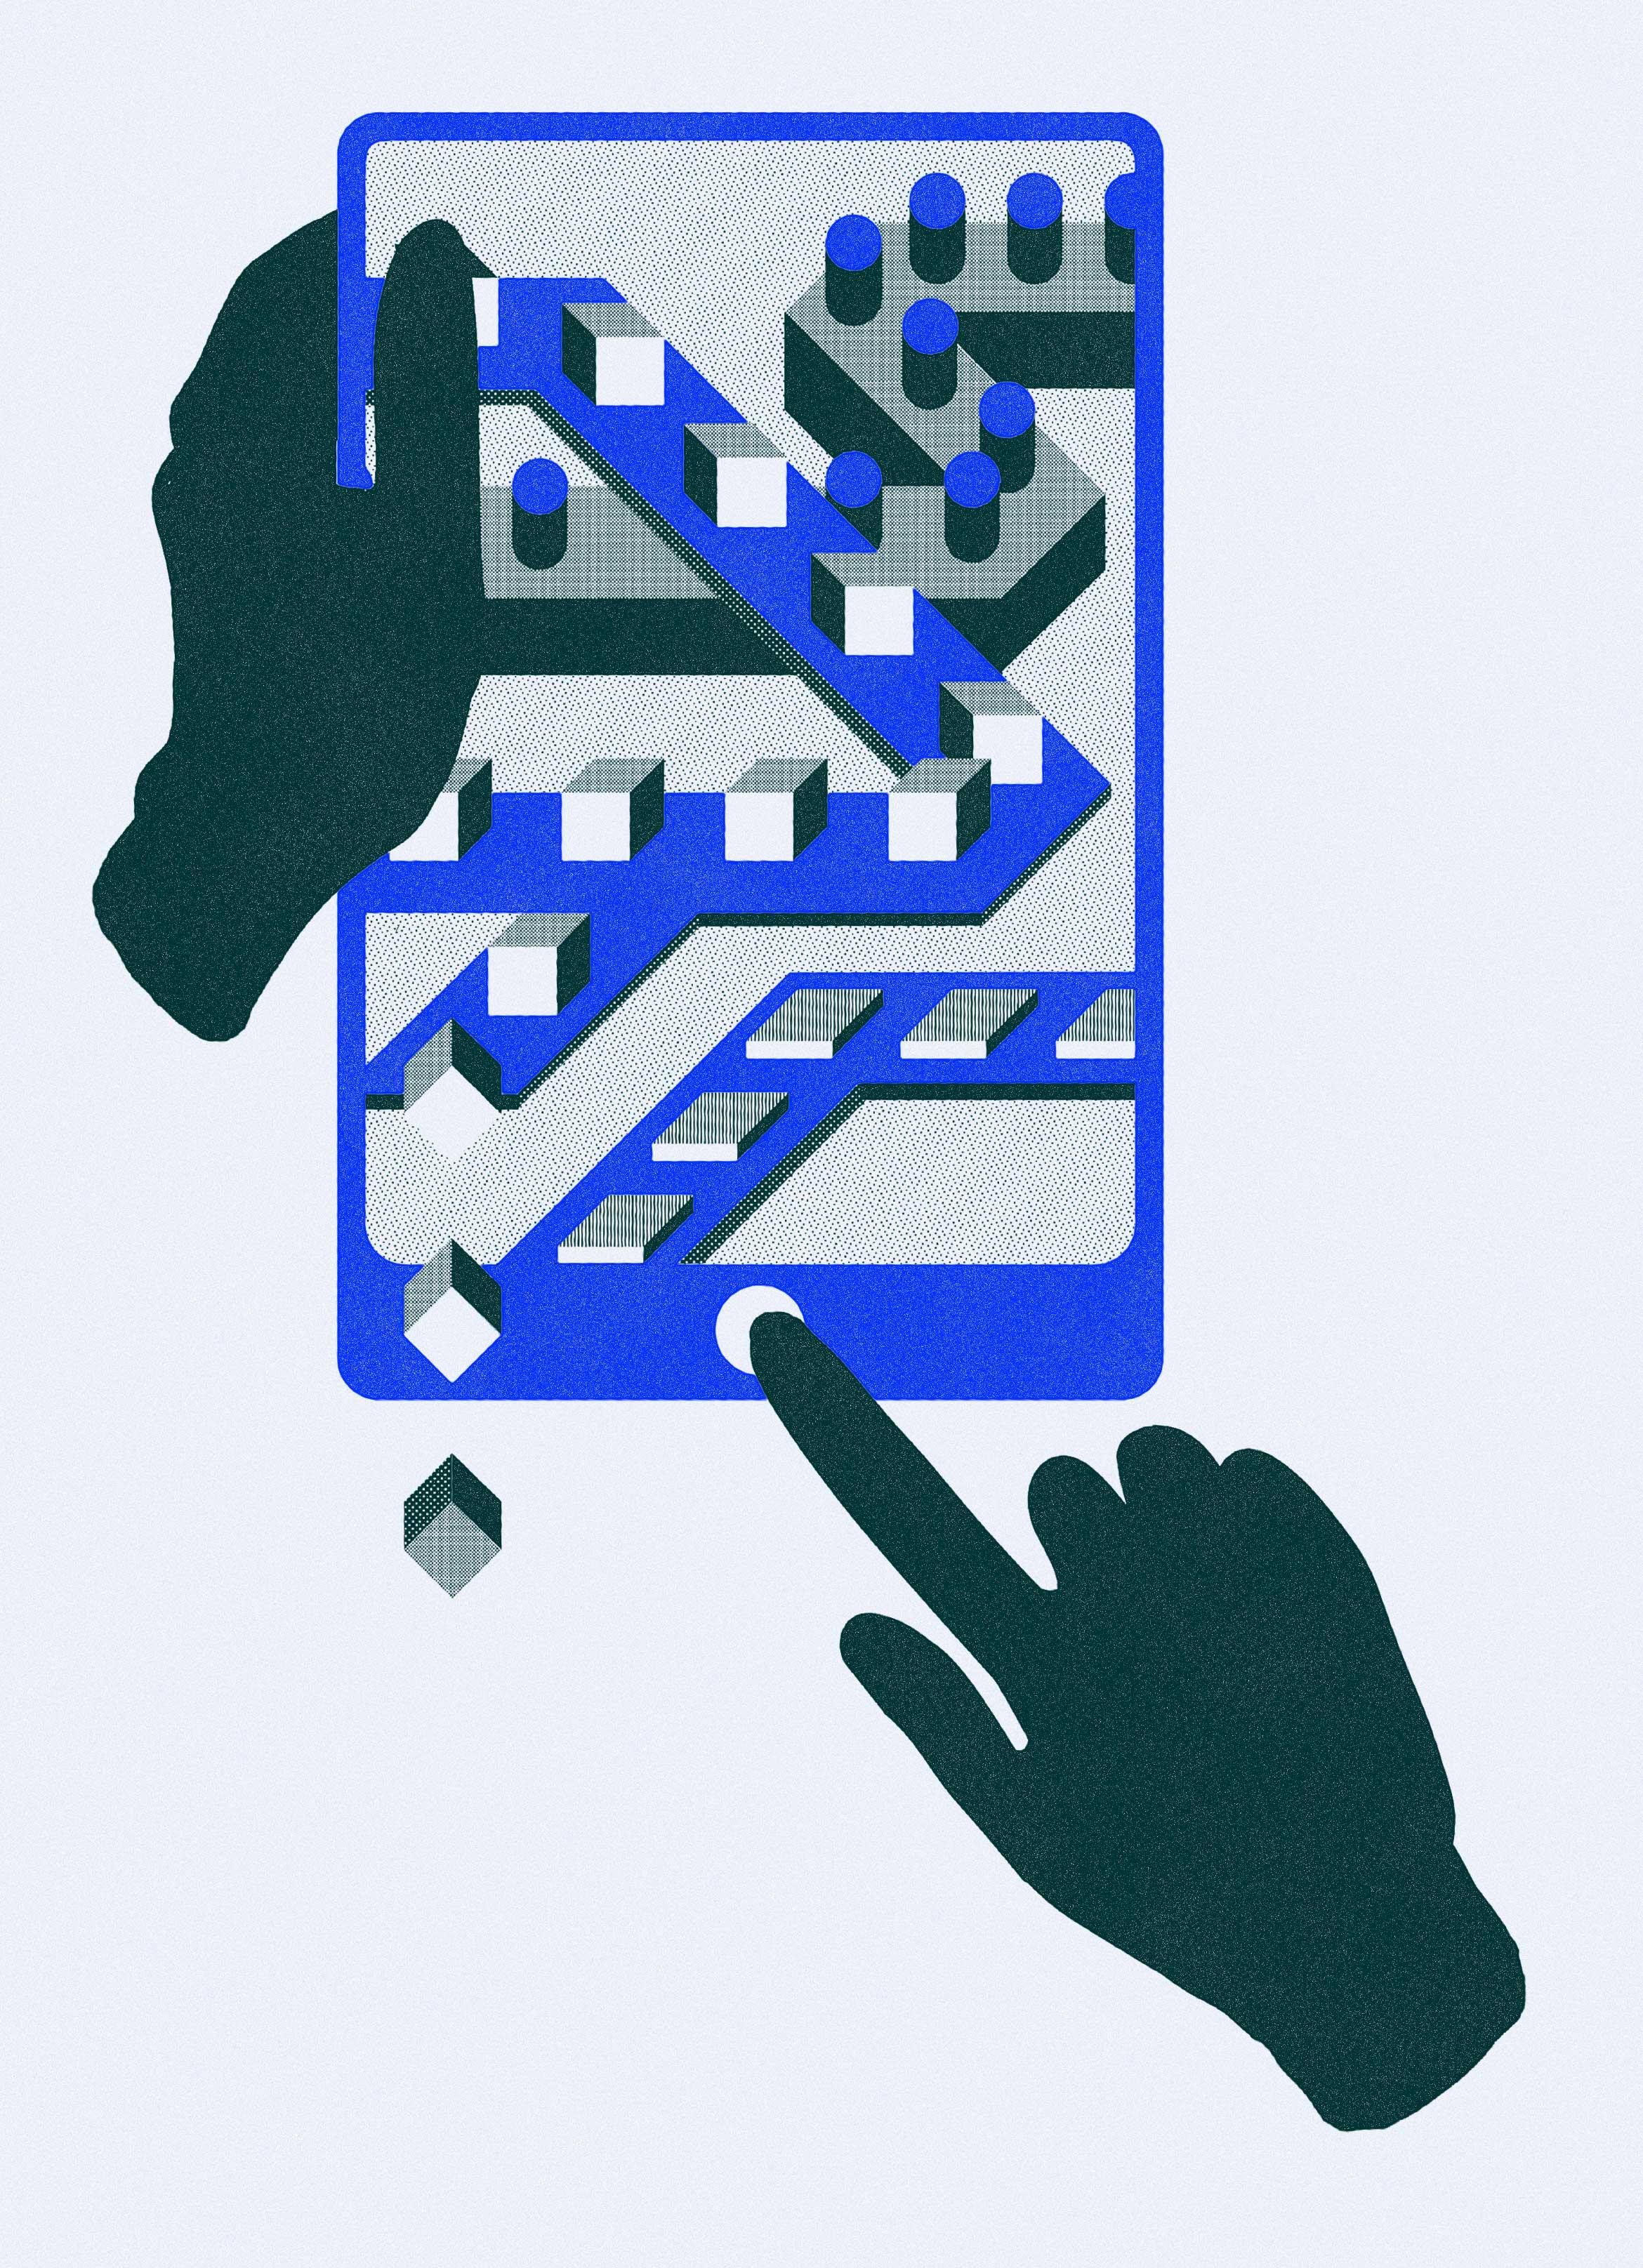 Juliaschwarzillustration-digitalisierung-ipad